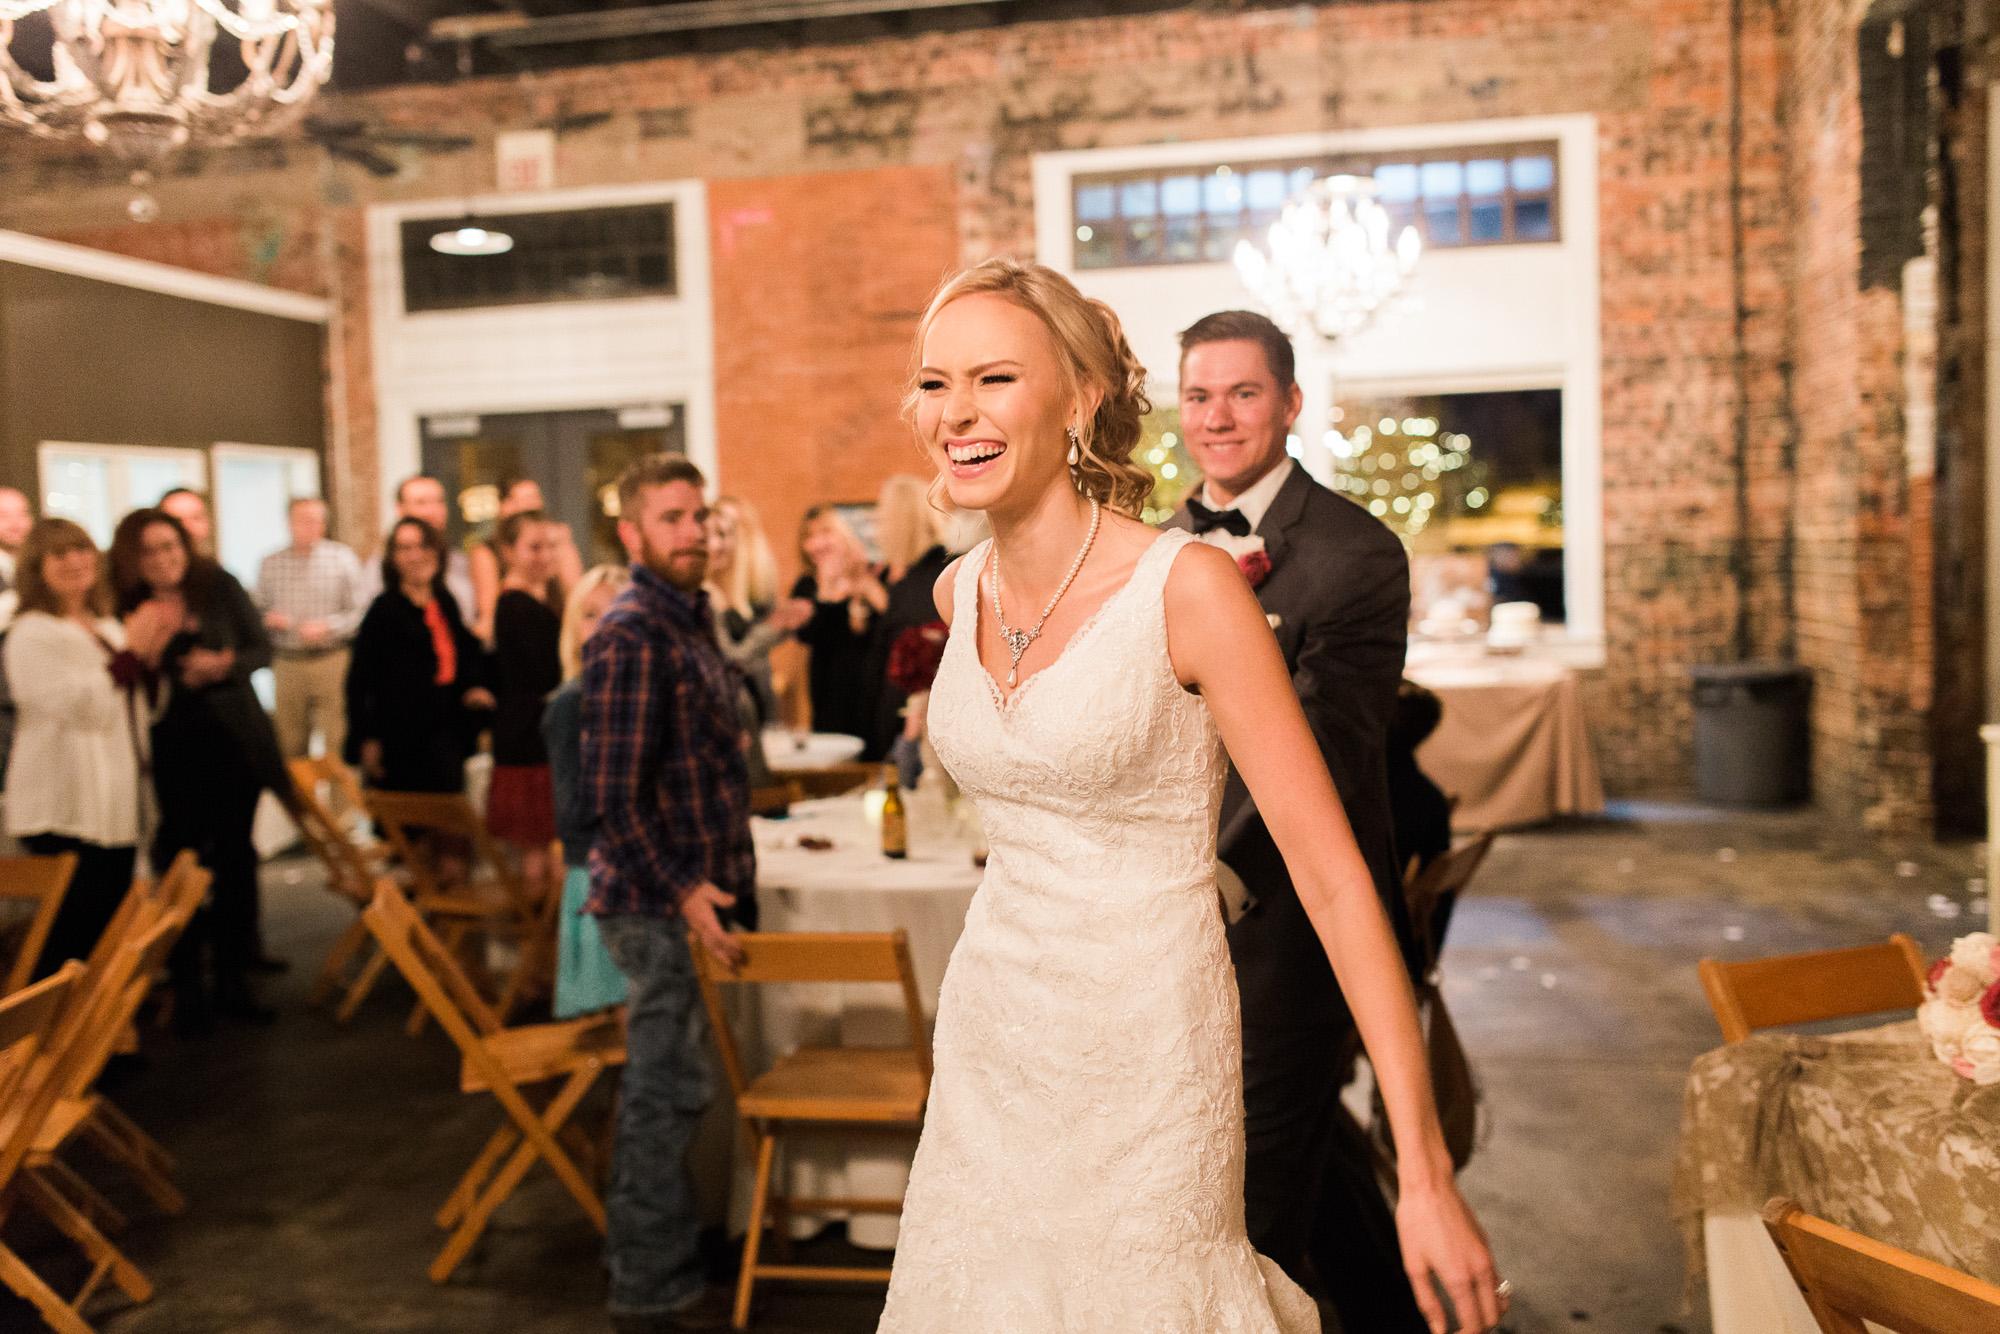 517a9-downtown-bryan-weddingdowntown-bryan-wedding.jpg